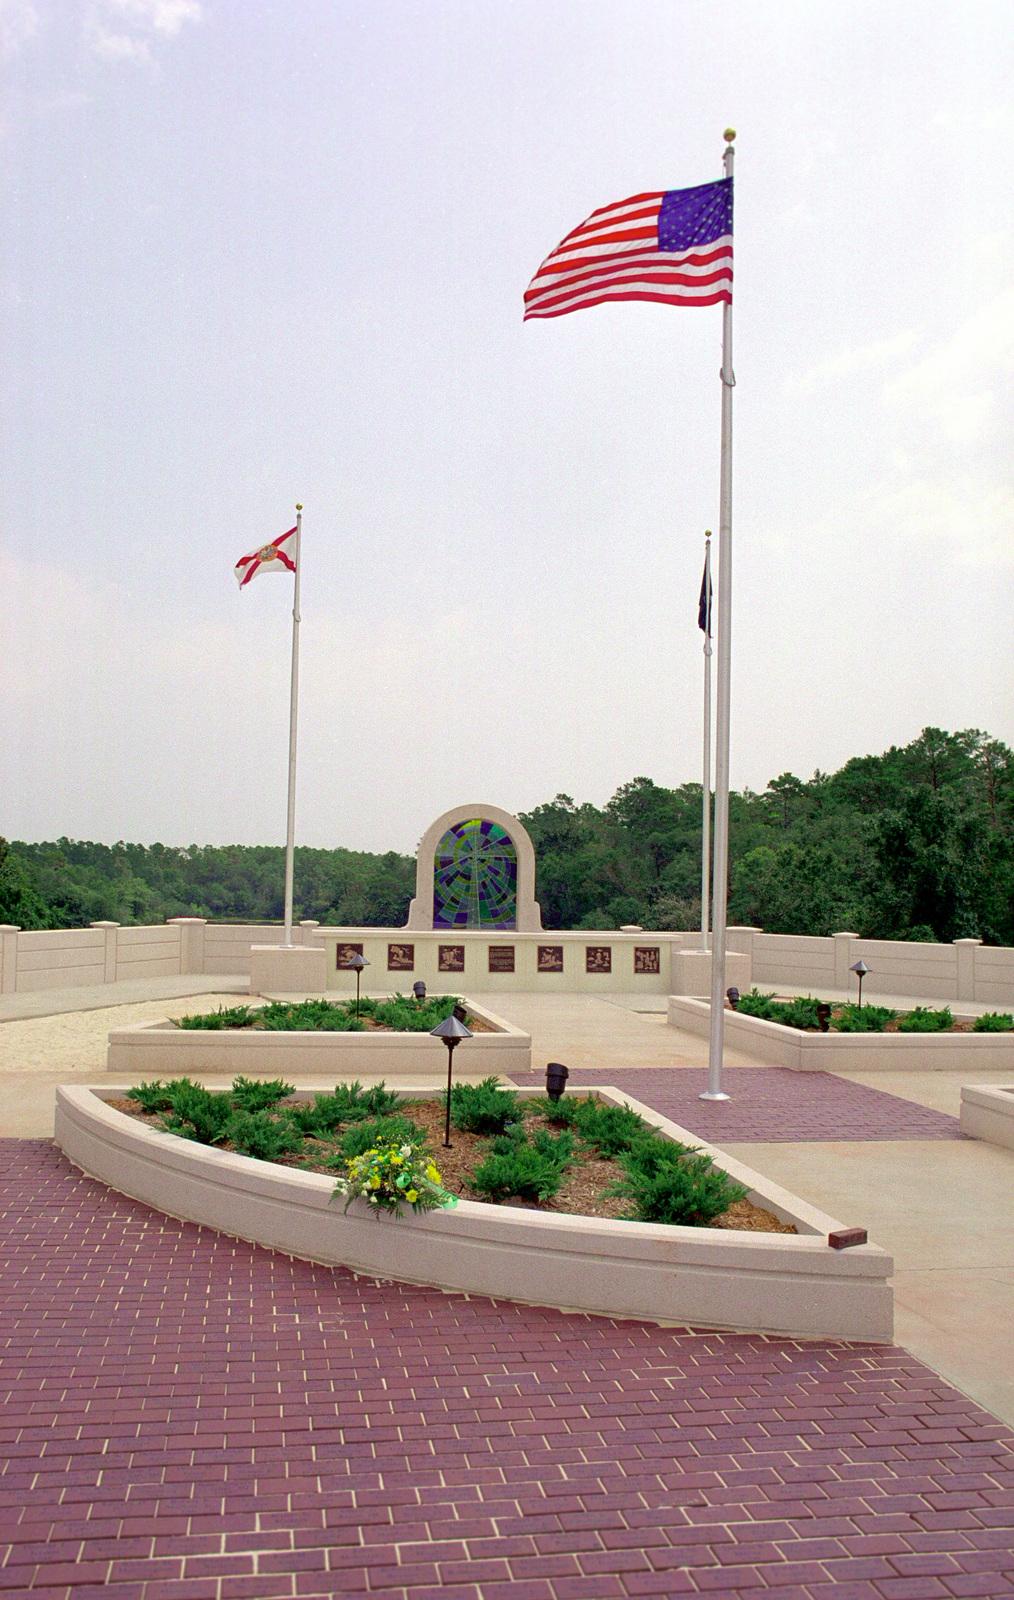 The All Veterans Memorial located at Memorial Lake on Eglin